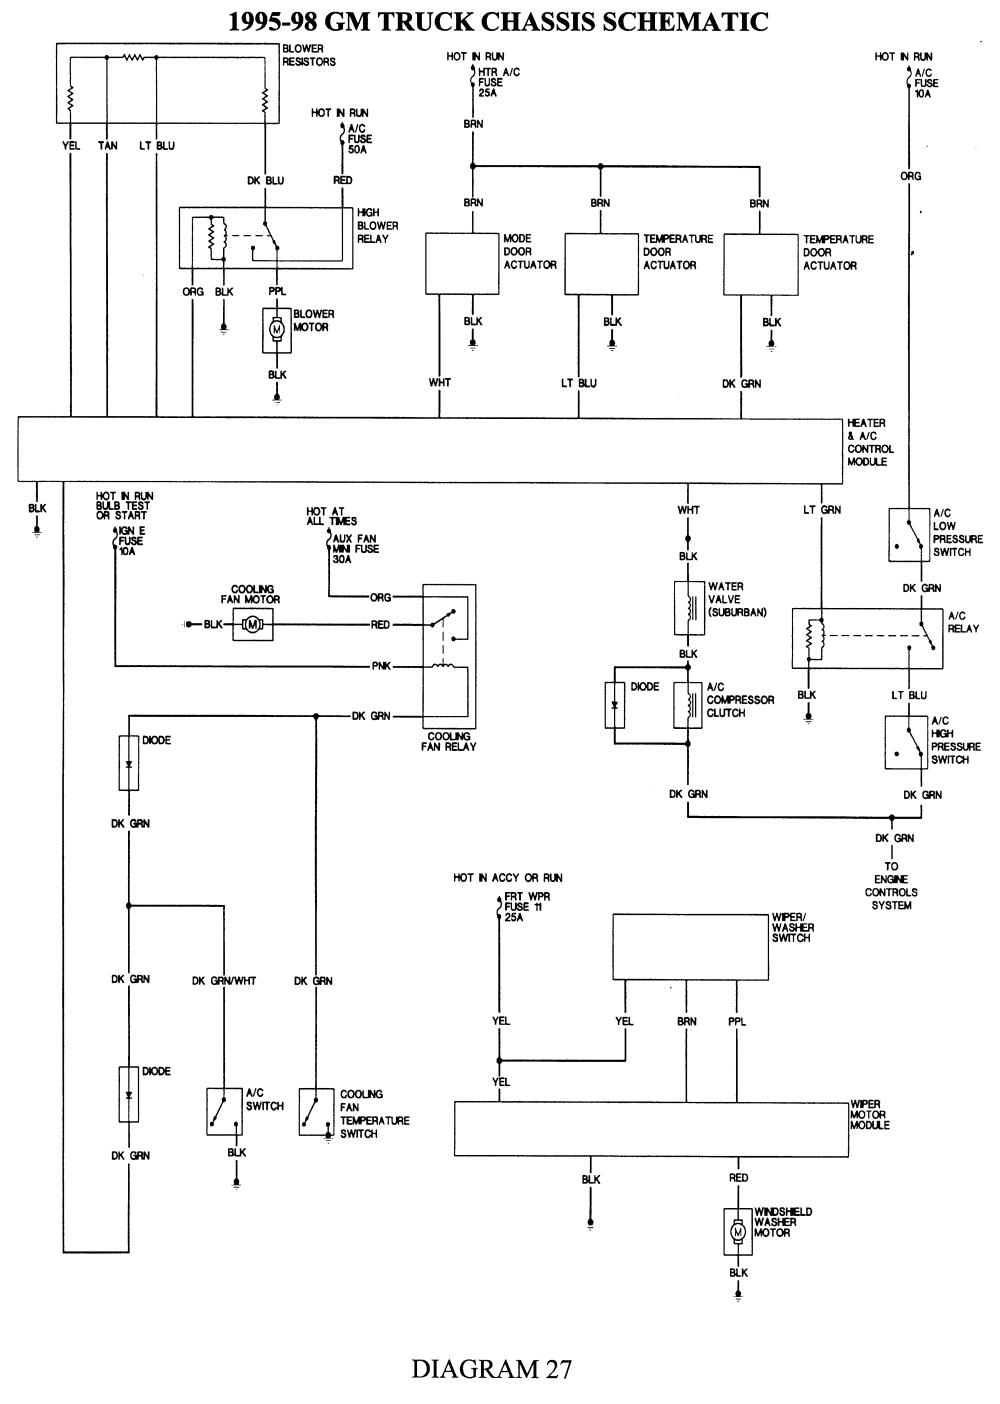 Speakon Wiring Diagram 1995 Chevrolet Silverado Wiring Wiring Diagram Article Review